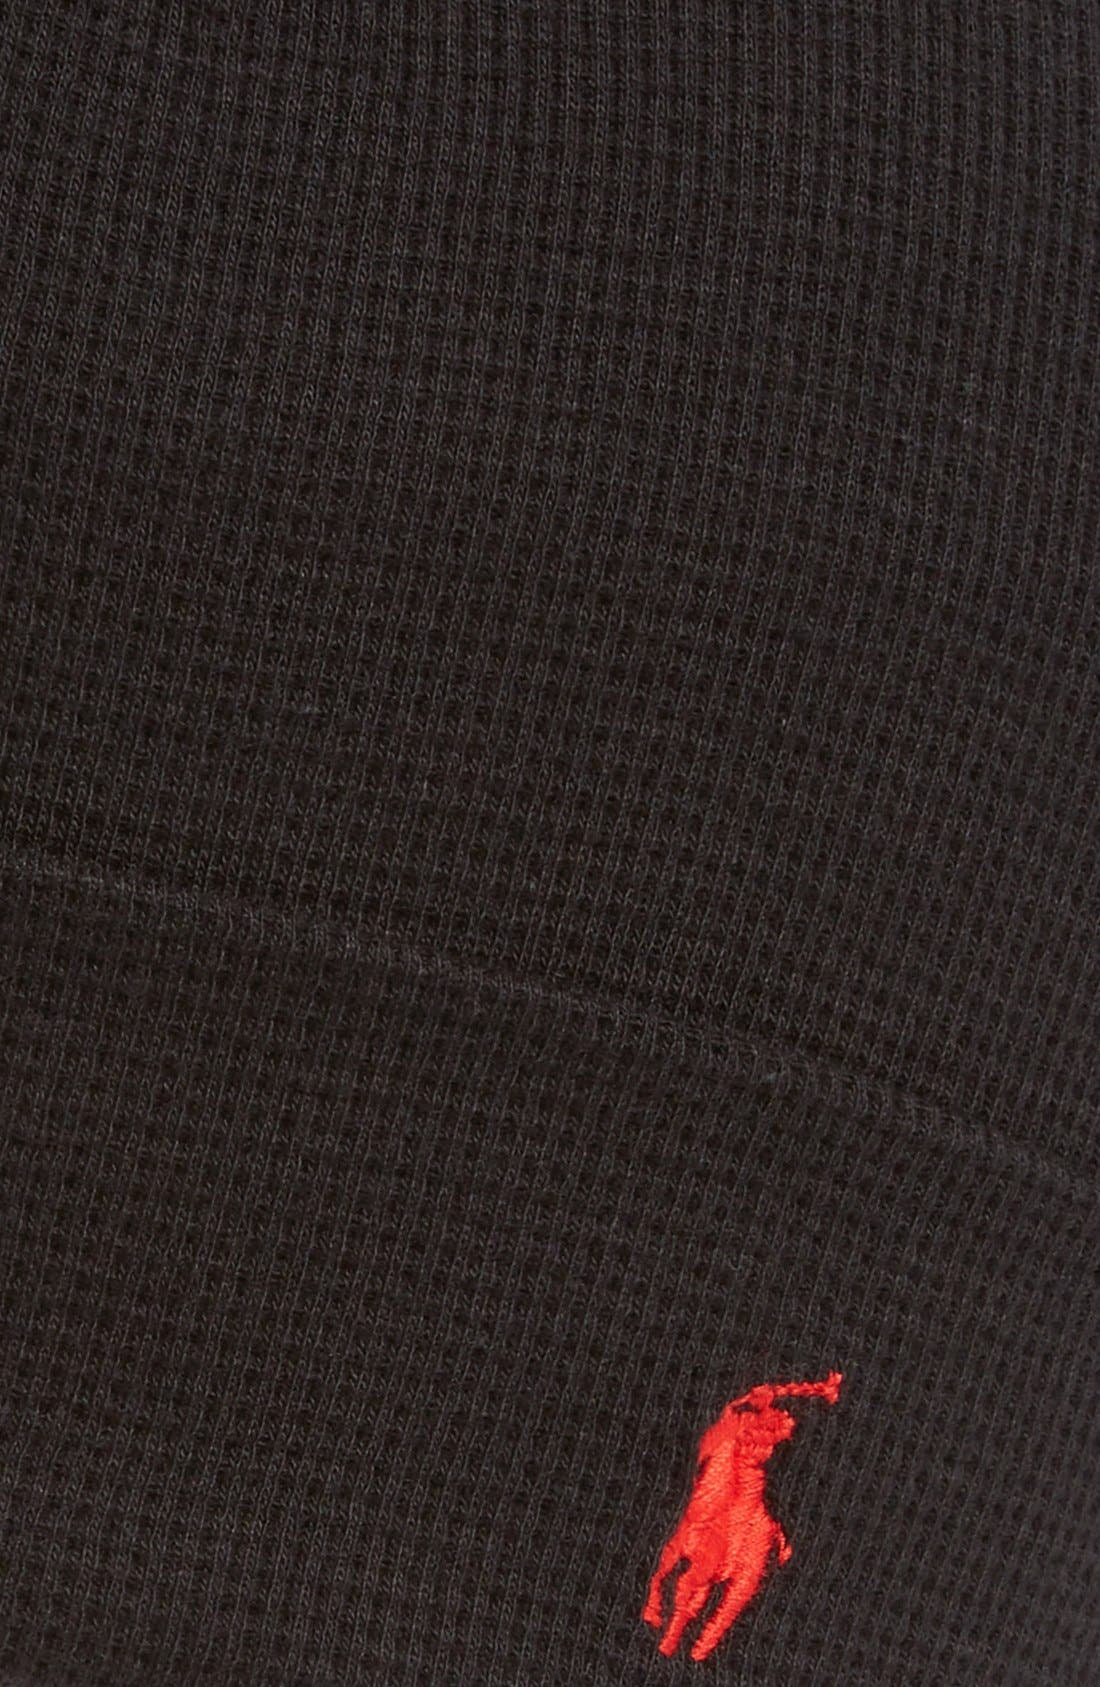 Thermal Cuff Cotton Cap,                             Alternate thumbnail 4, color,                             001